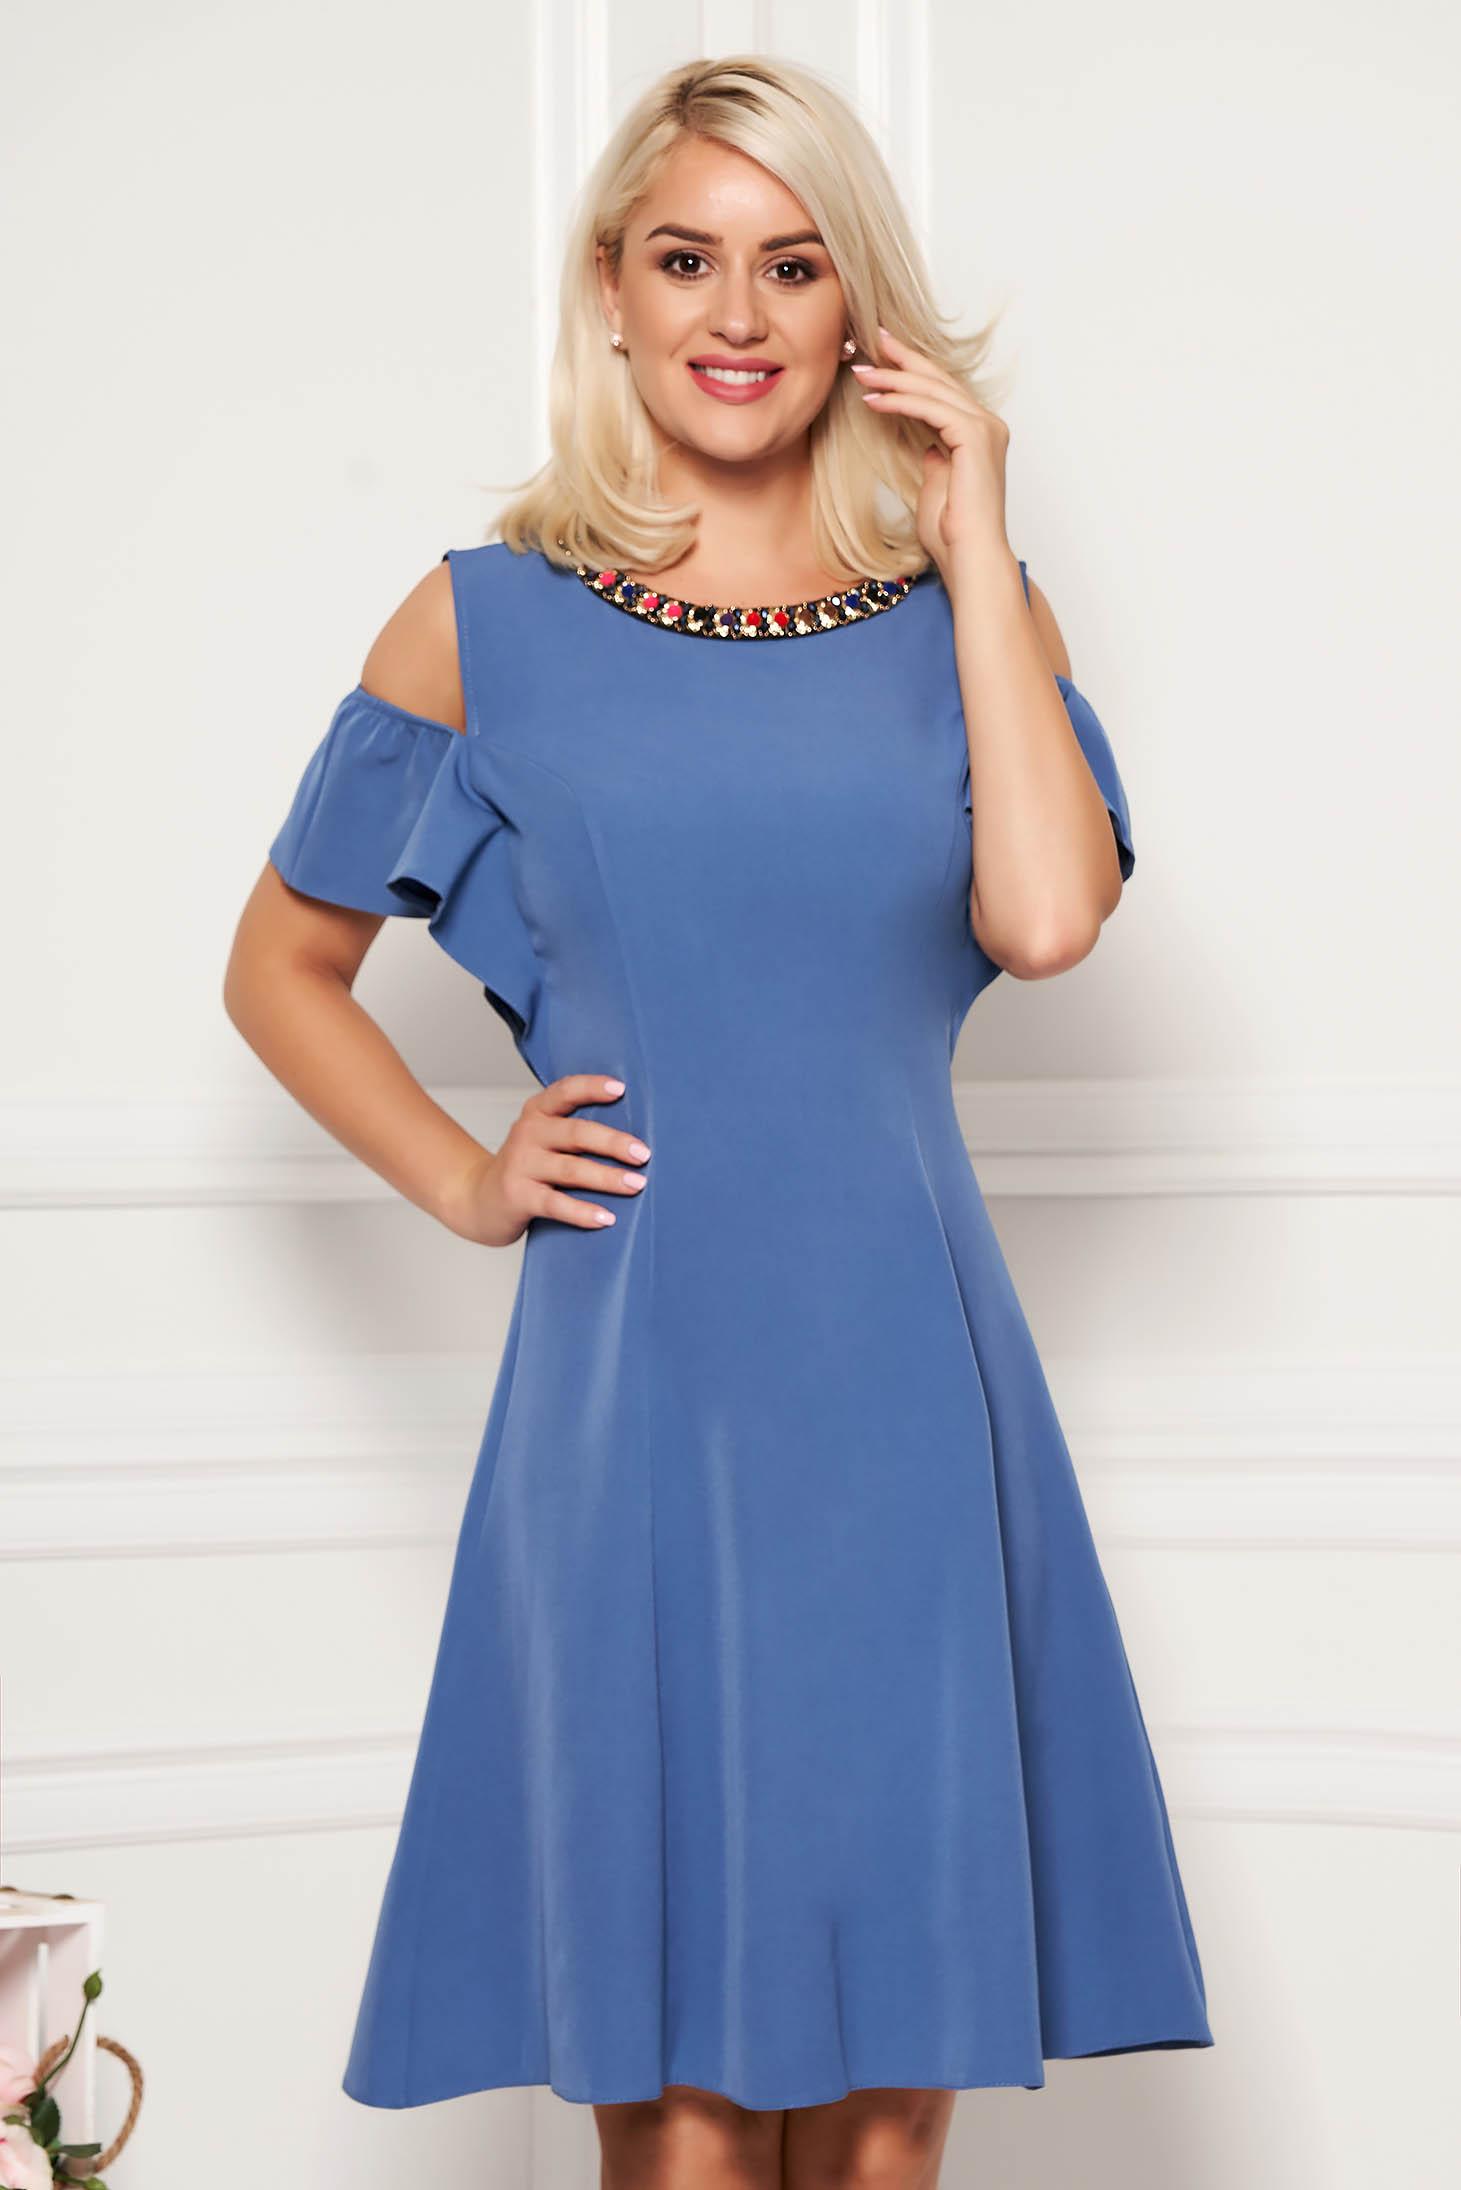 Rochie albastru-deschis de zi in clos din material fin la atingere cu aplicatii metalice si umeri decupati